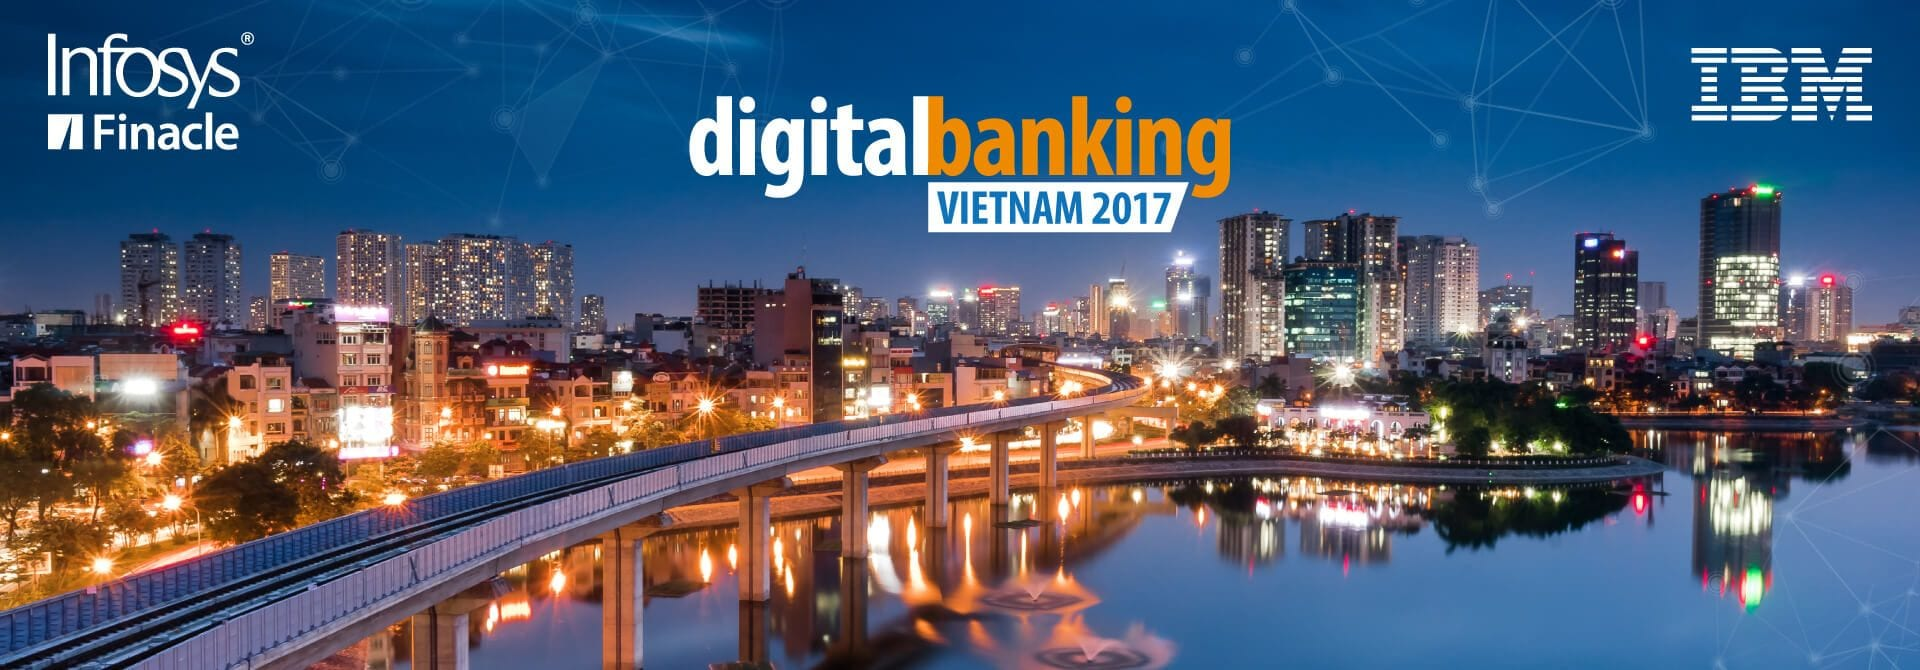 digital-banking-vietnam